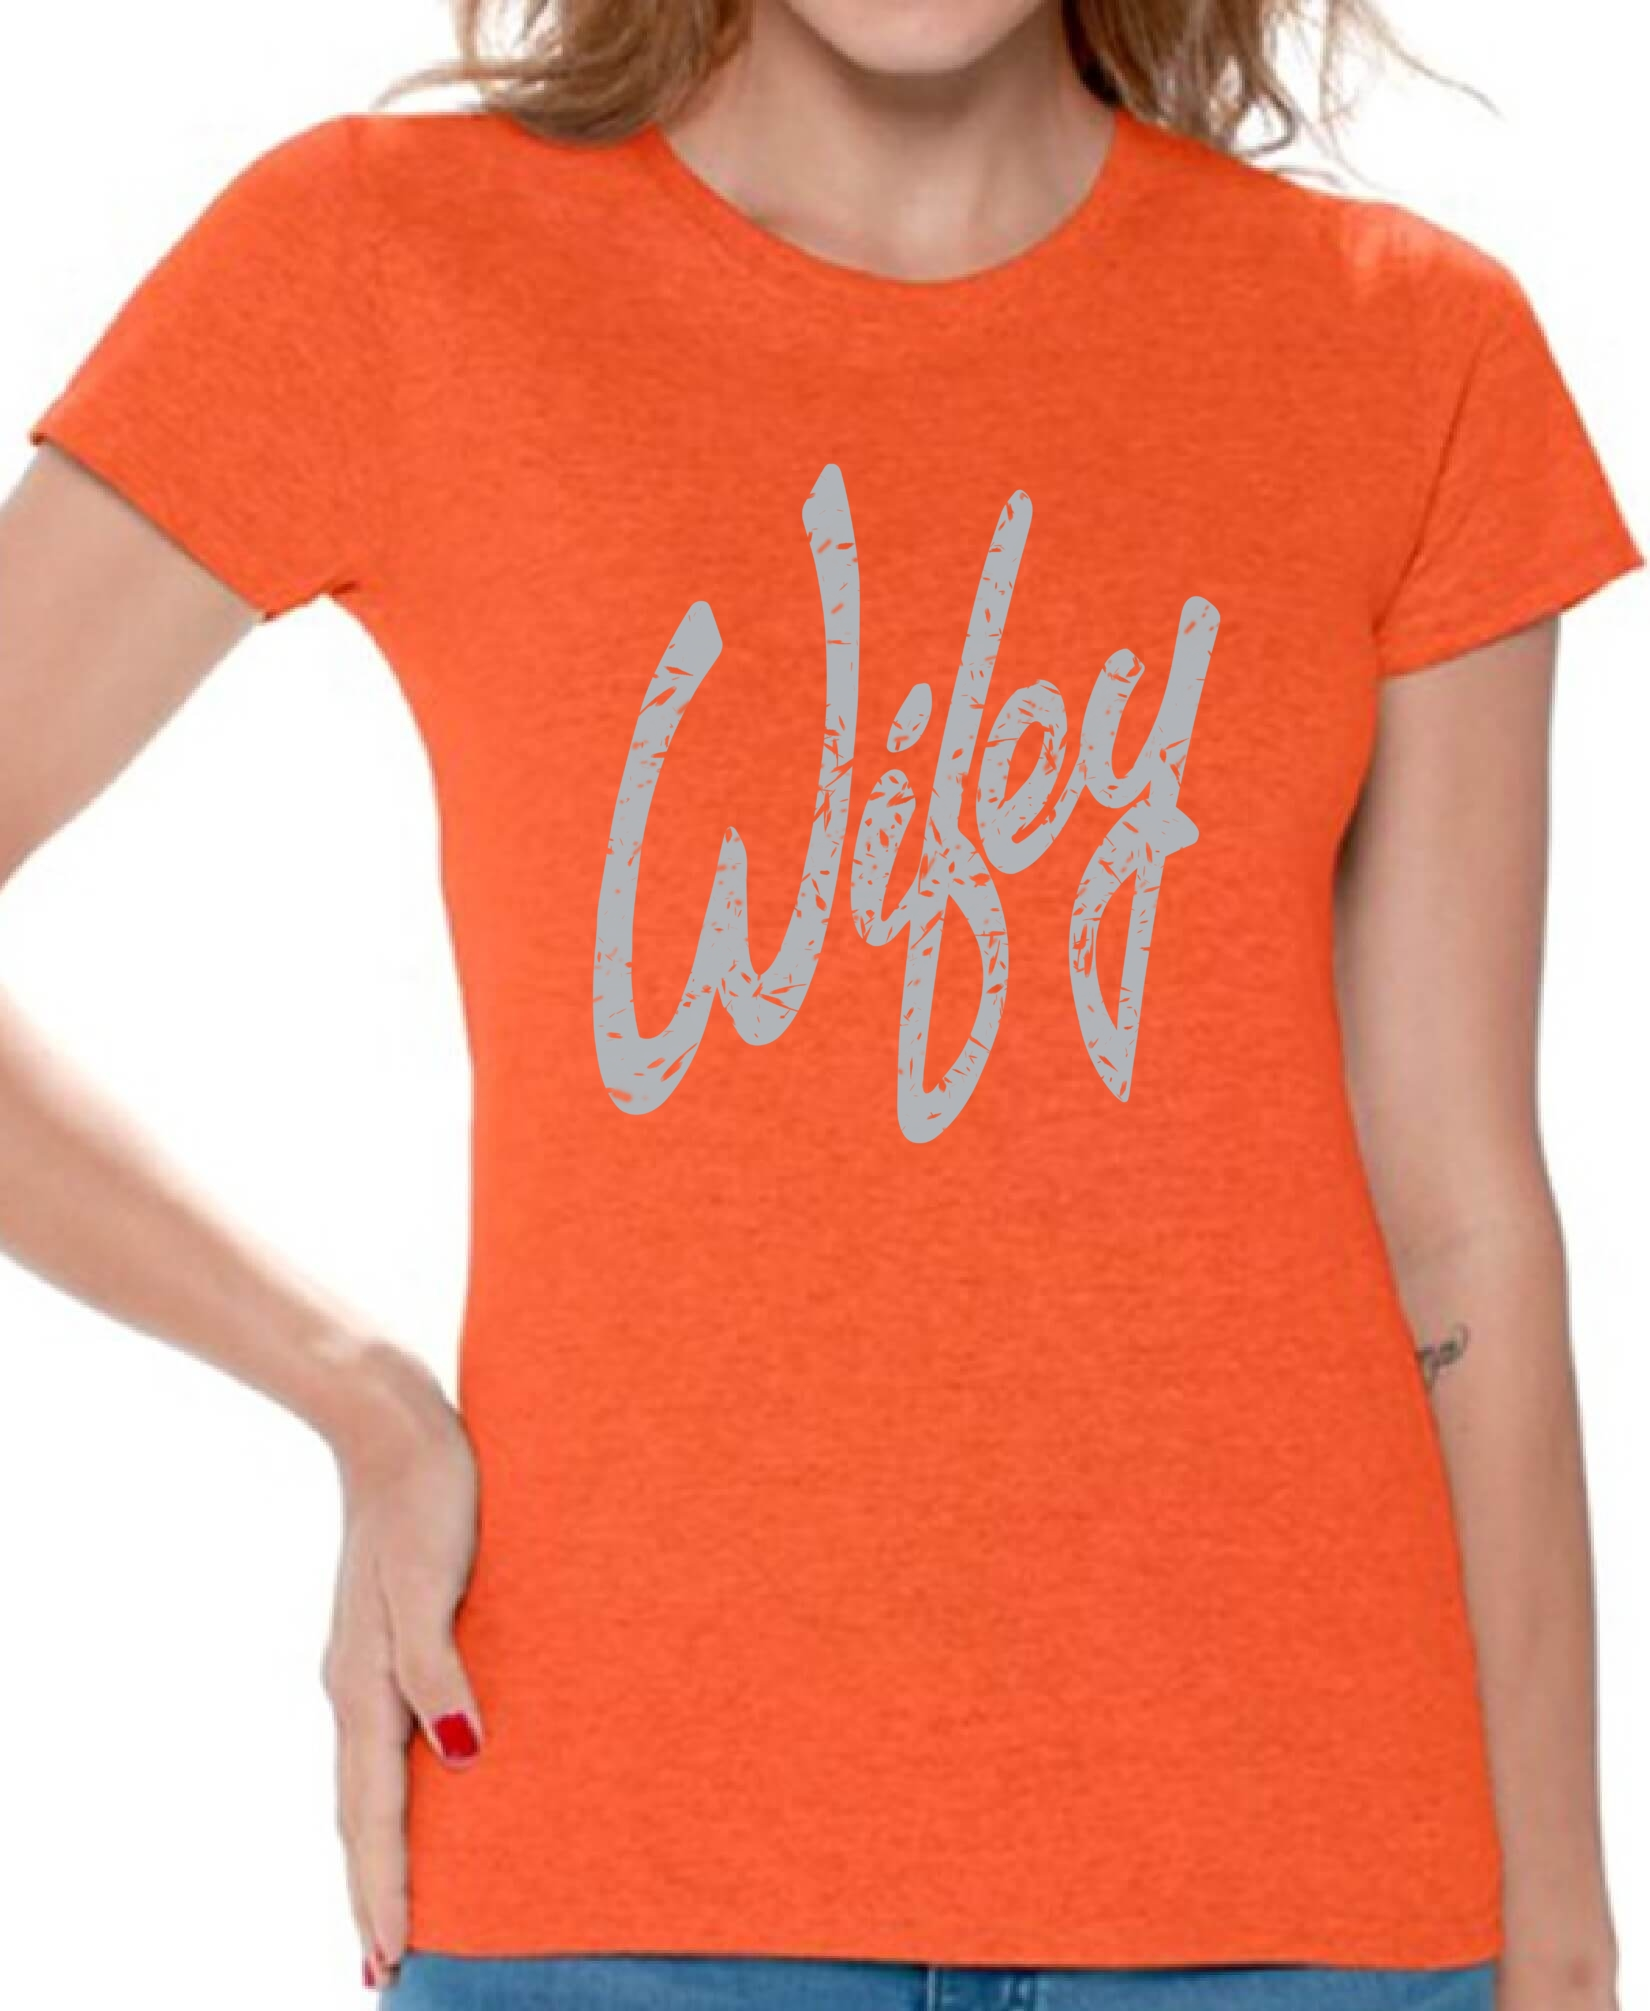 Wifey T Shirt Best Wife Gift Anniversary Birthday Wedding Women Ladies Tee Top